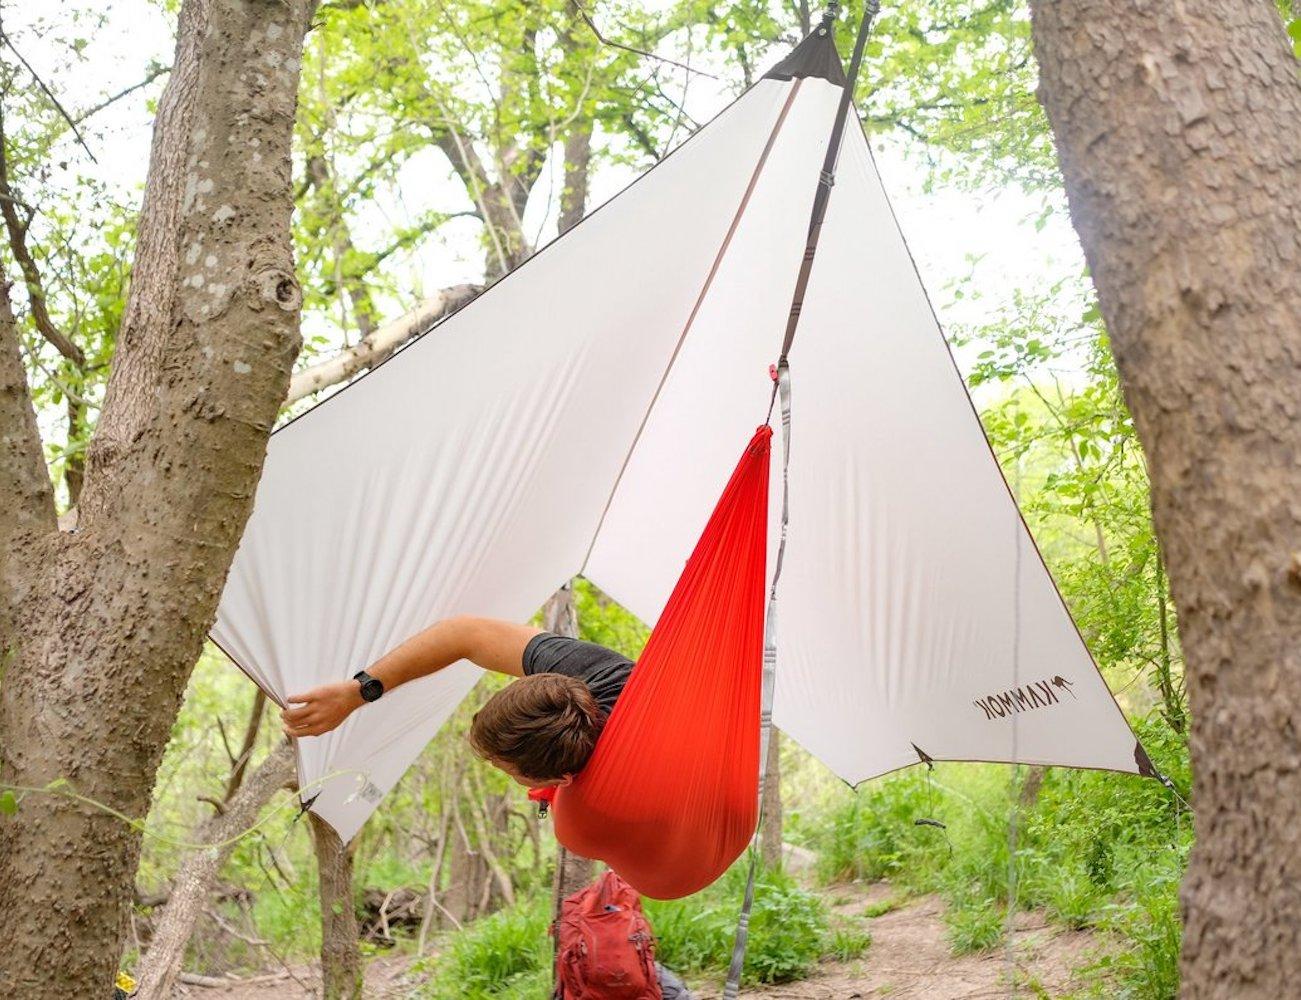 Kammok Ultralight Lightweight Camping Gear ups your camp experience